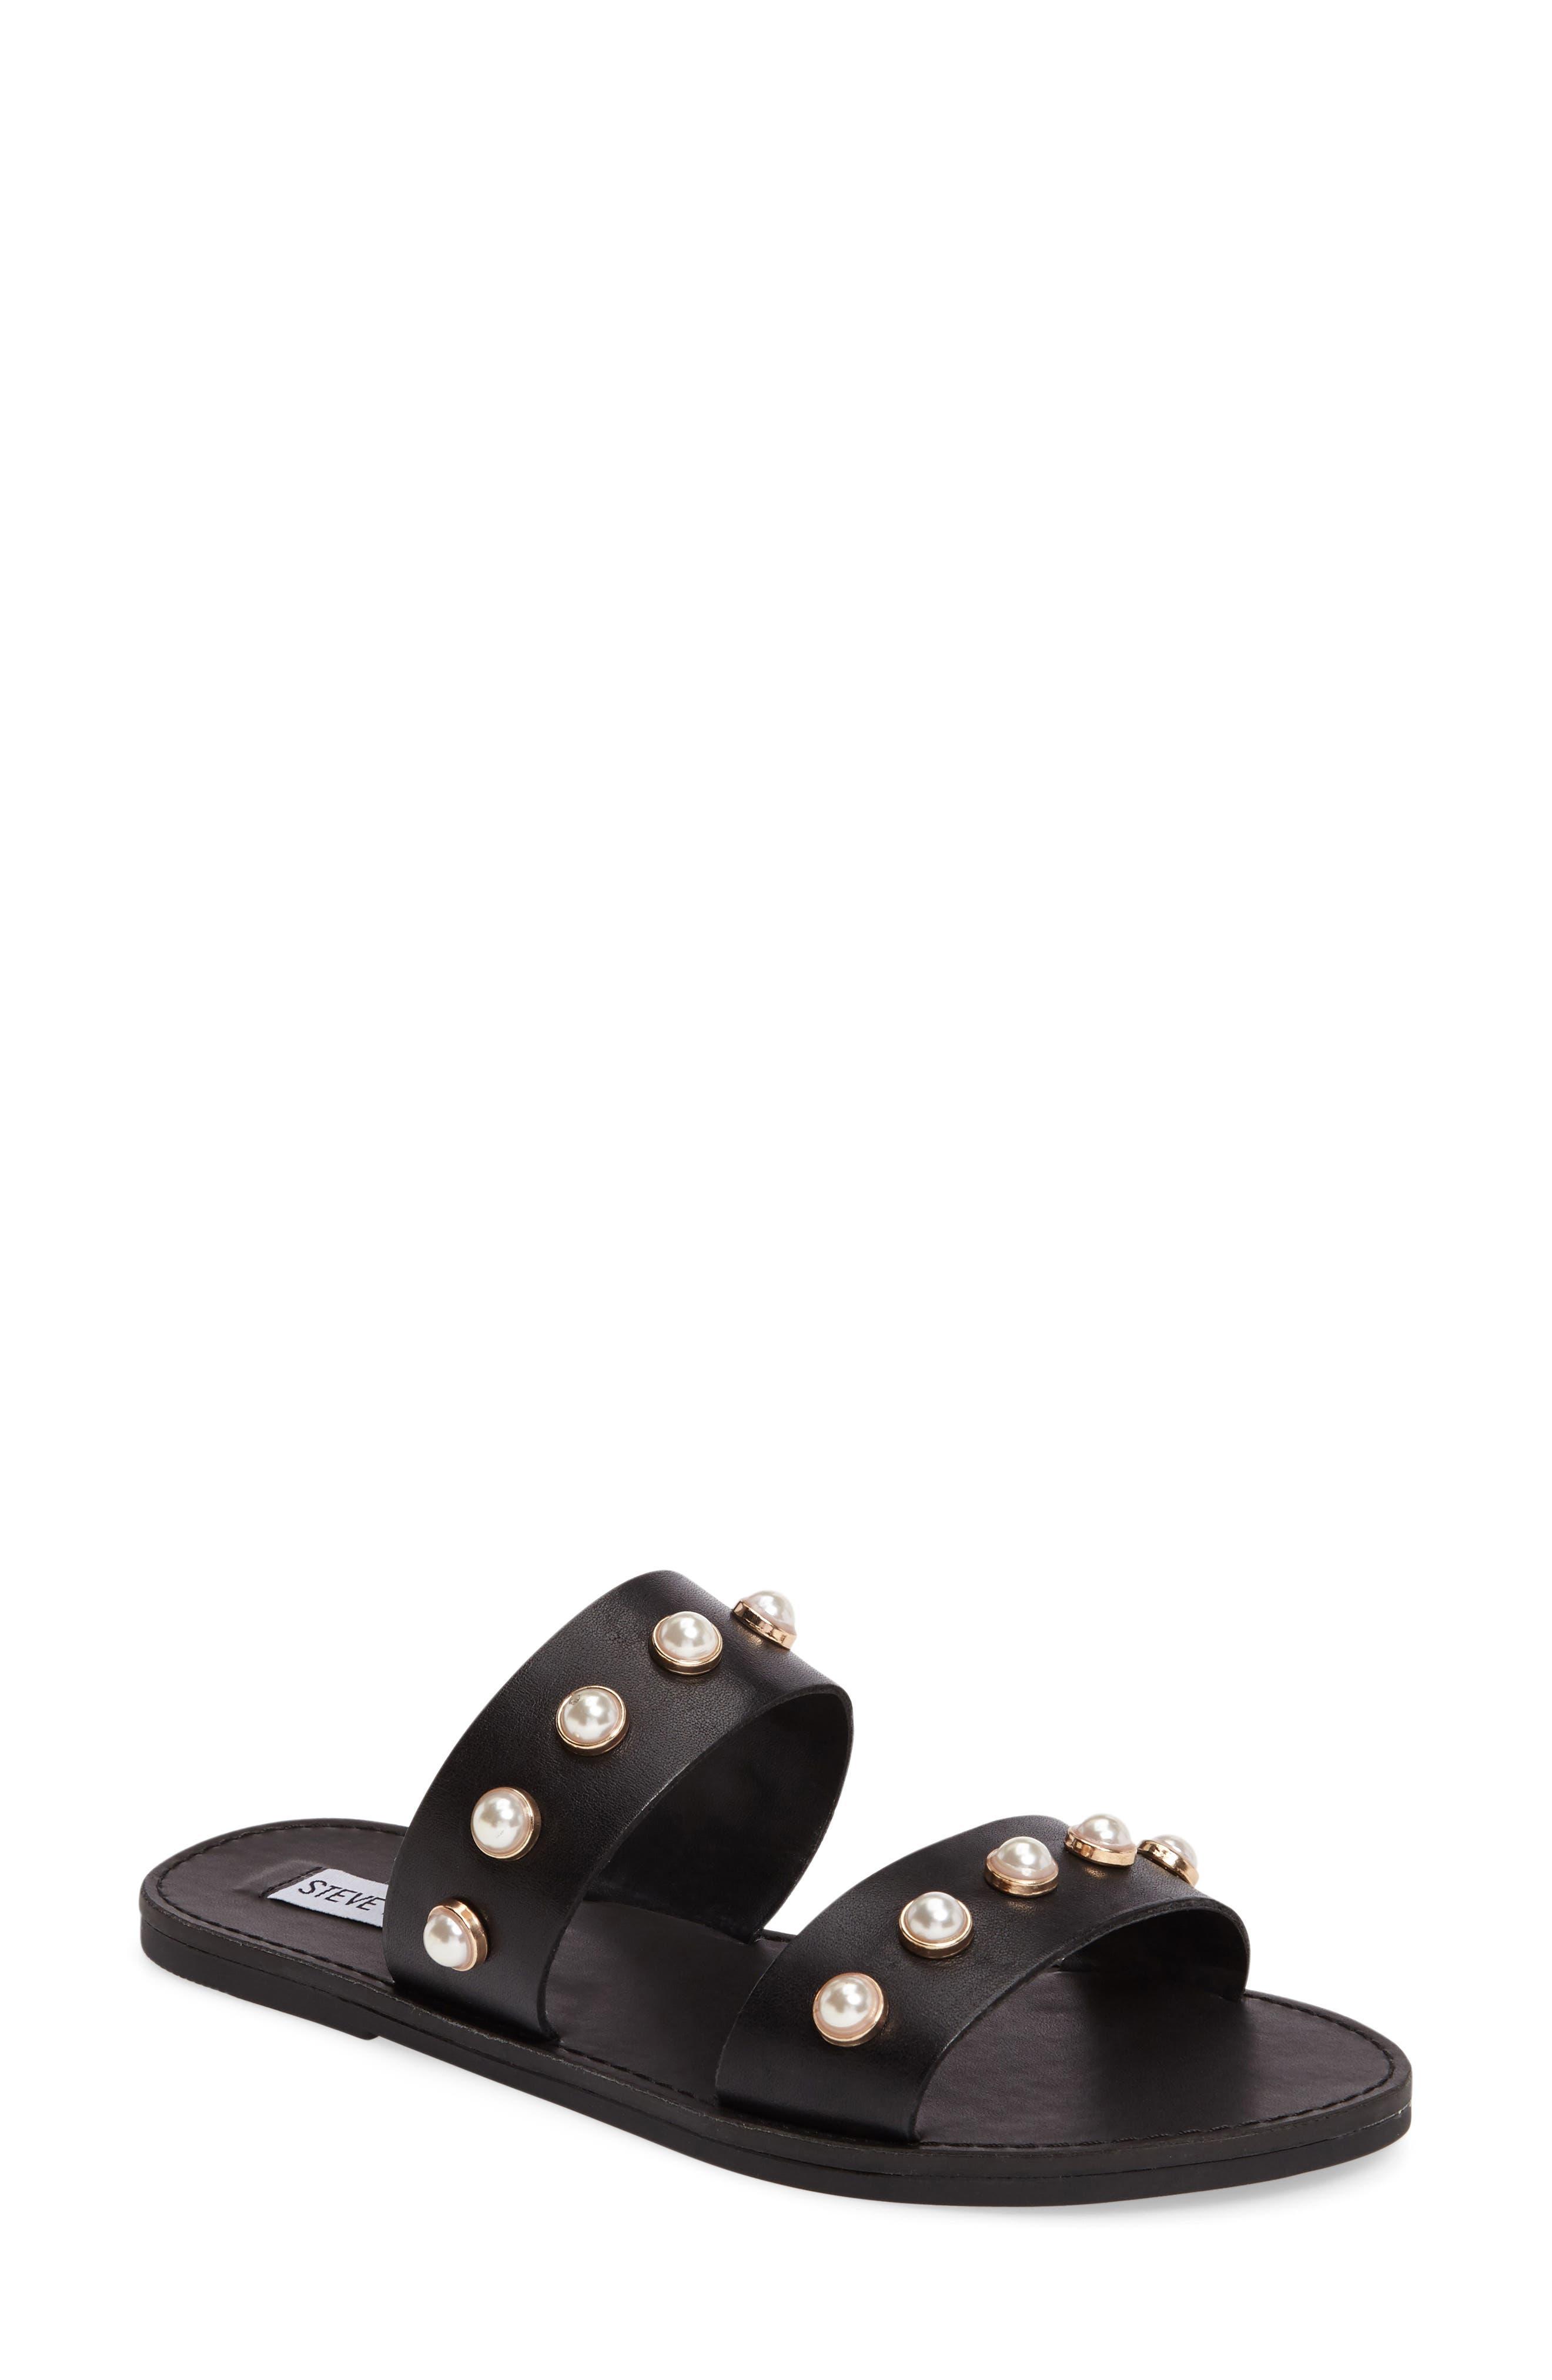 Jole Embellished Slide Sandal,                             Main thumbnail 1, color,                             001